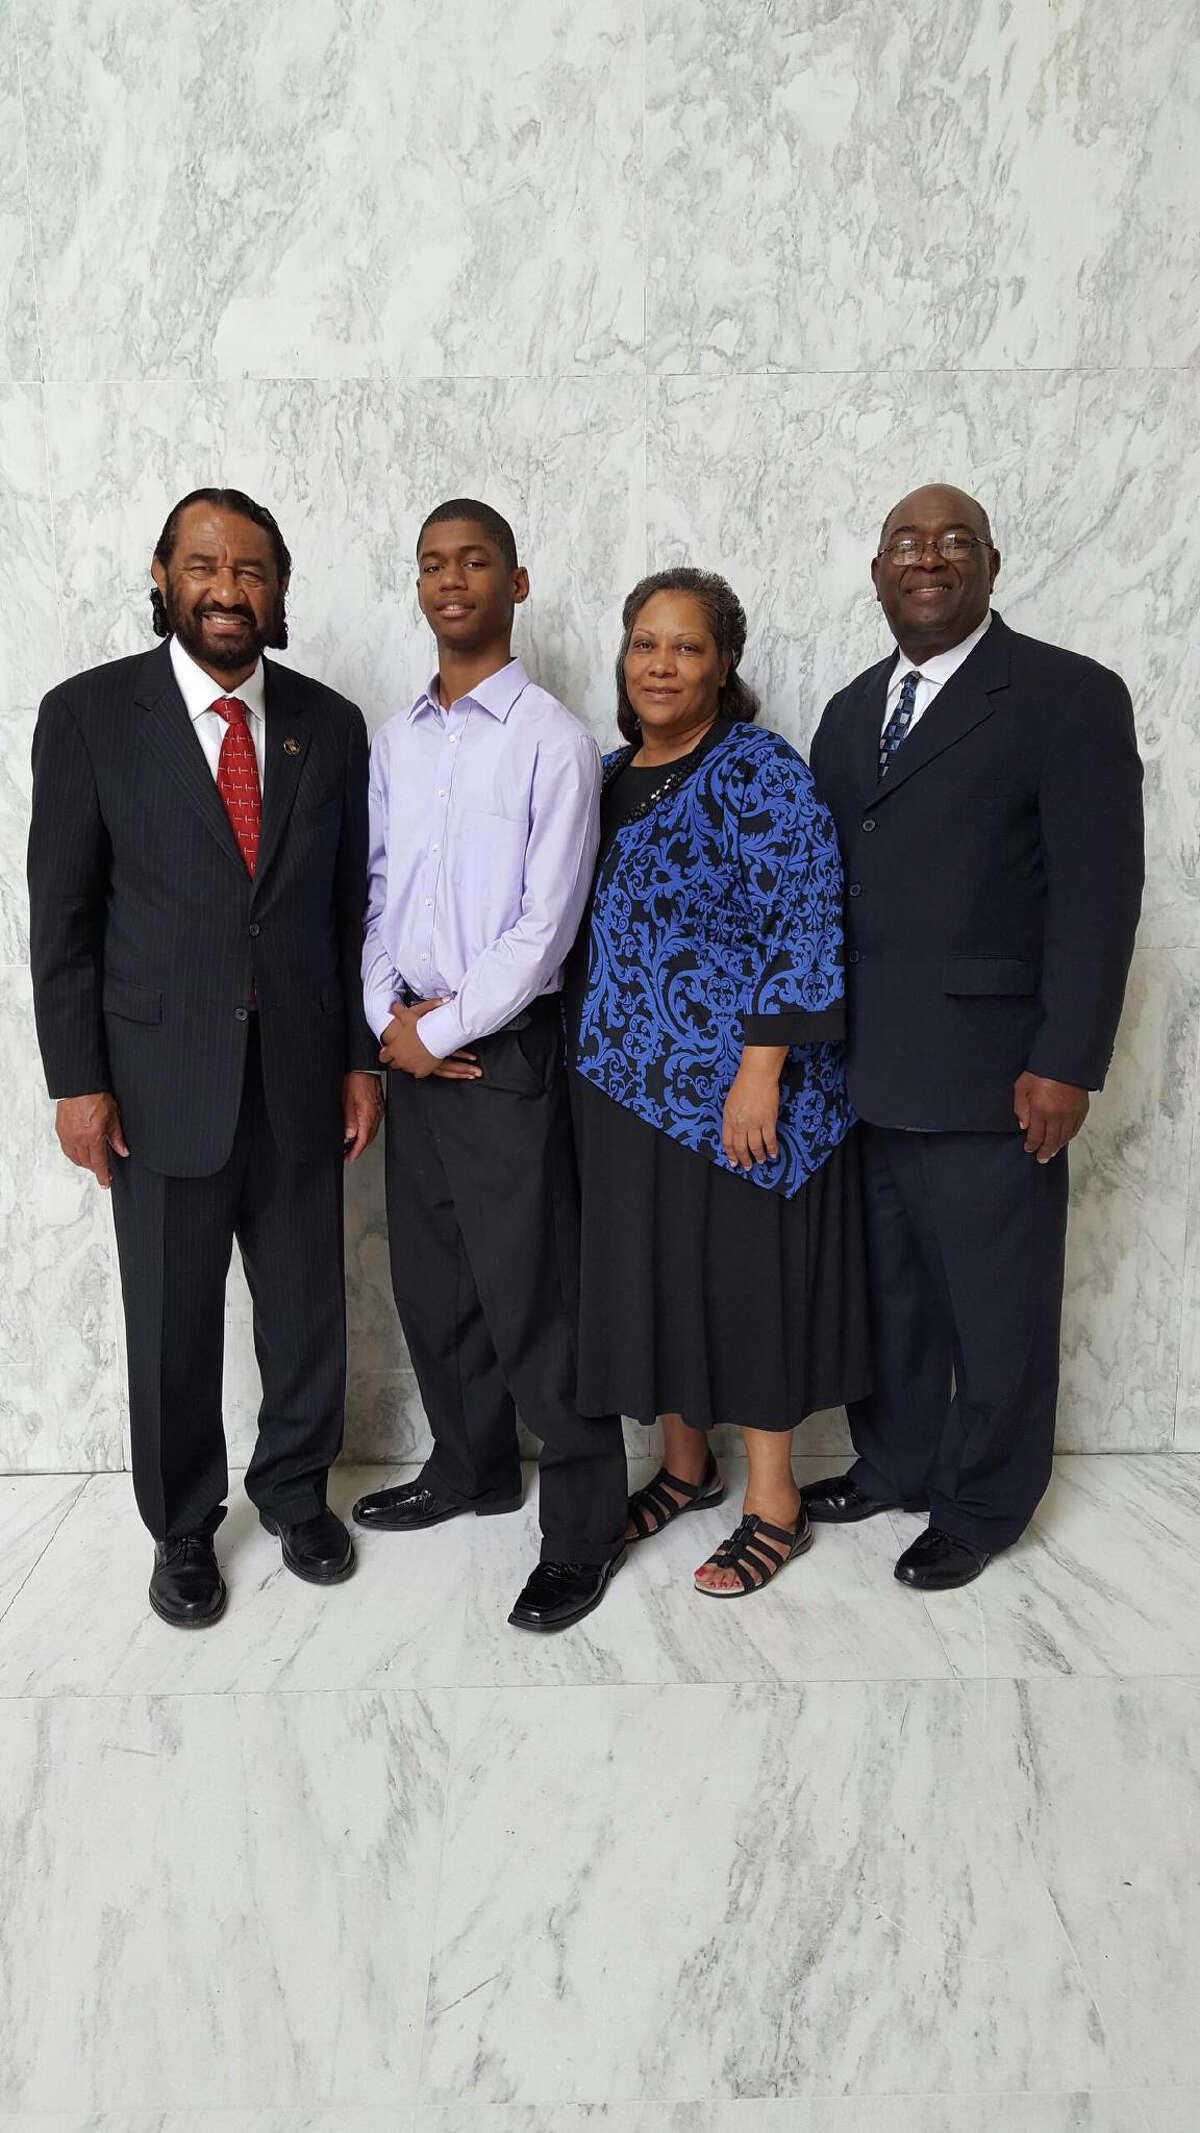 Congressman Al Green, Juqua Gamble, Linda Gamble, and Charles Gamble in Washington, DC during the last weekend of June 2016.